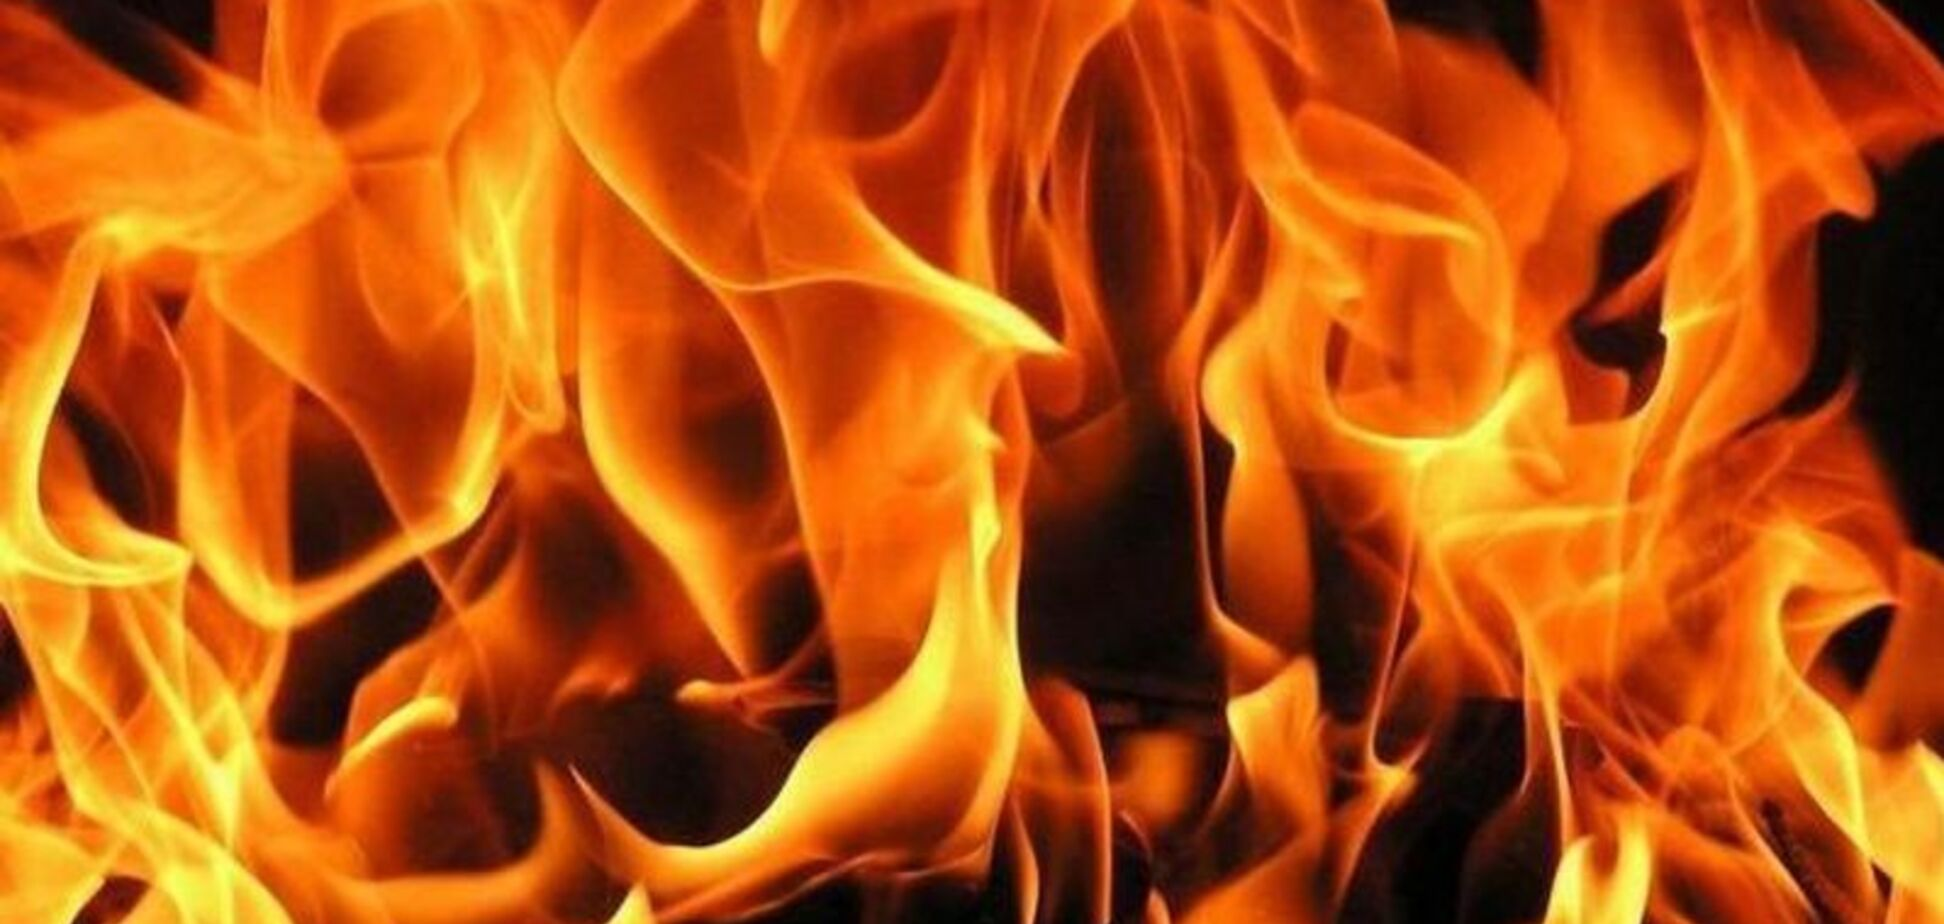 В Запорожье во время пожара погиб мужчина